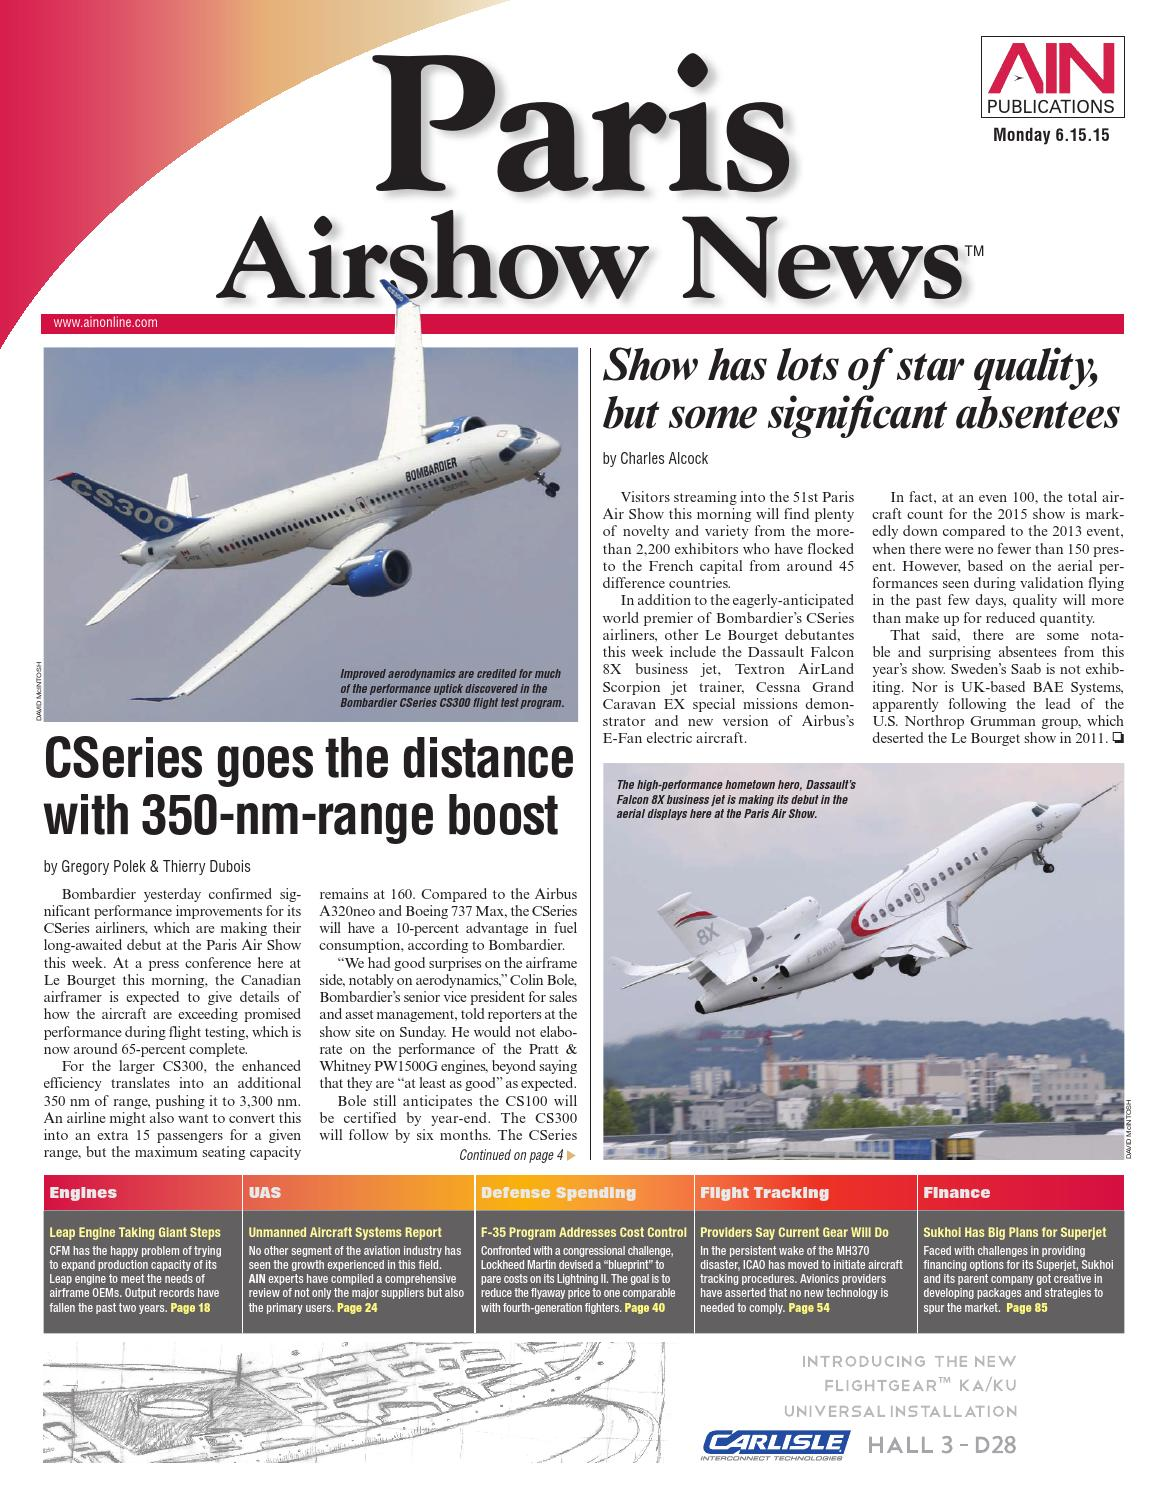 Textron Scorpion Jet News: Paris Airshow News 06-15-15 By Aviation International News